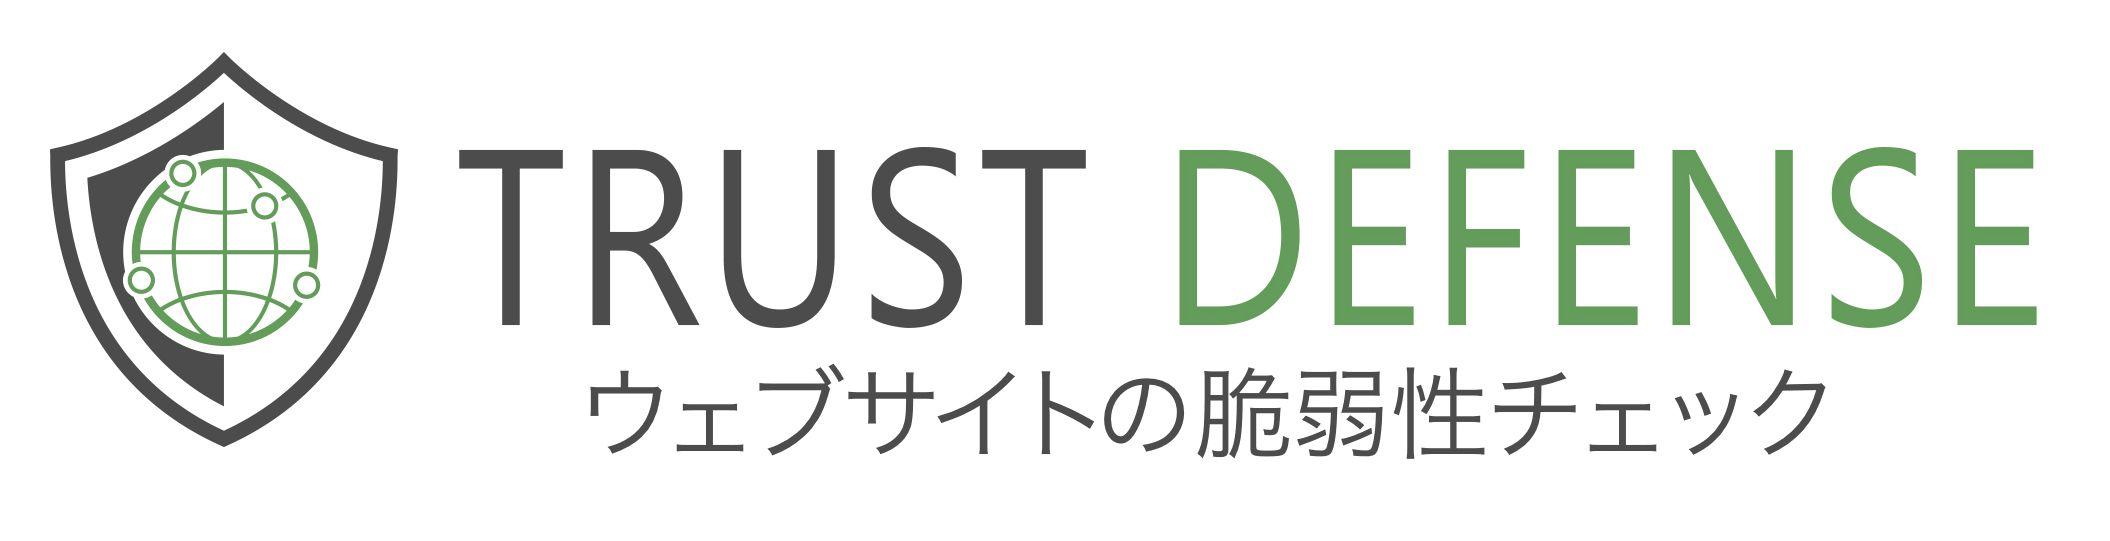 TRUSTDEFENSE-Logo1-2